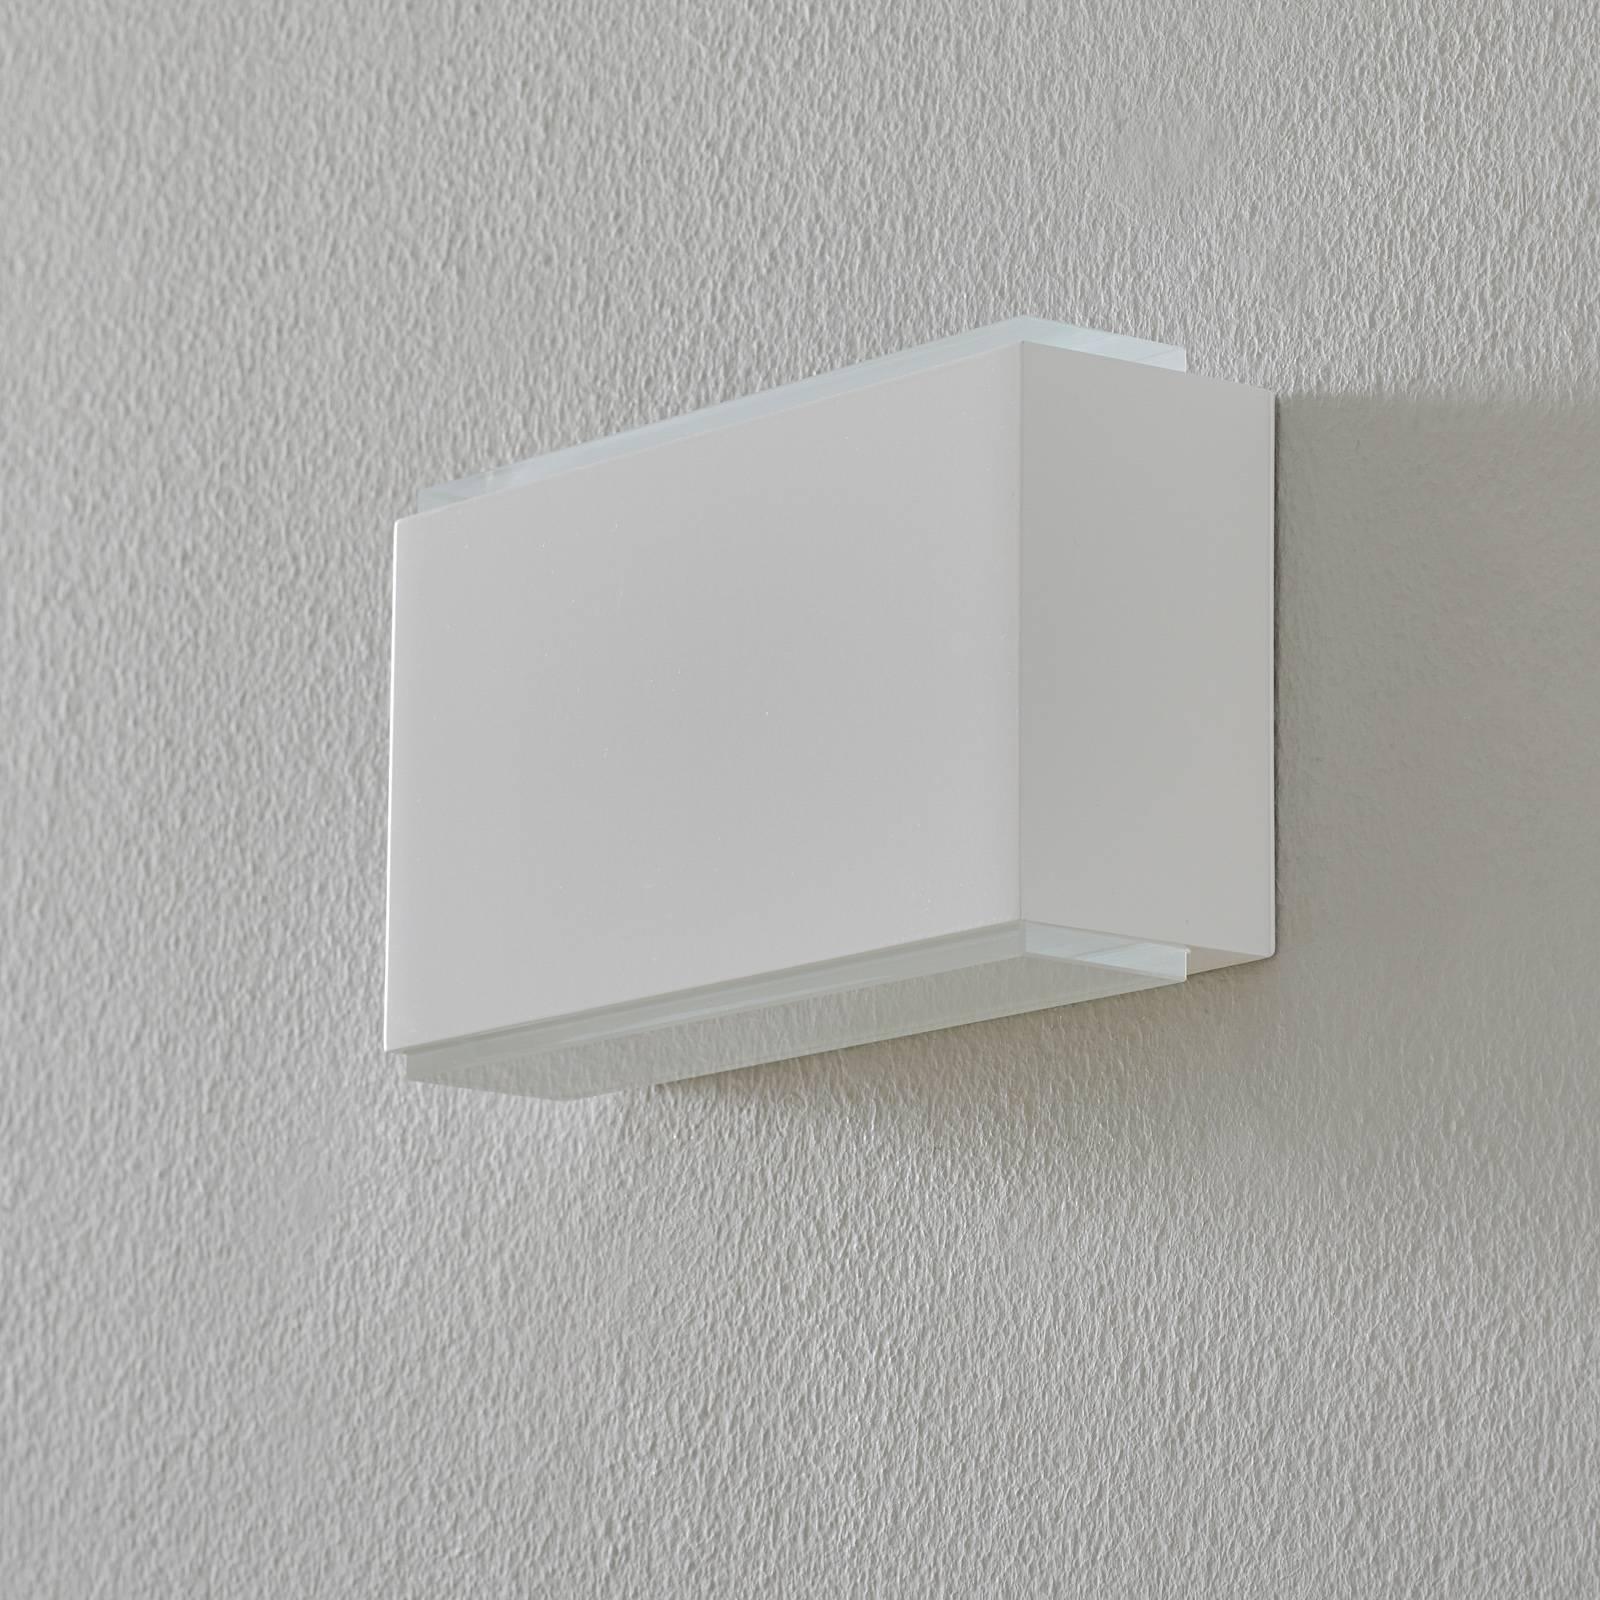 BEGA 23015 LED-seinälamppu 18cm valkoinen 1260lm